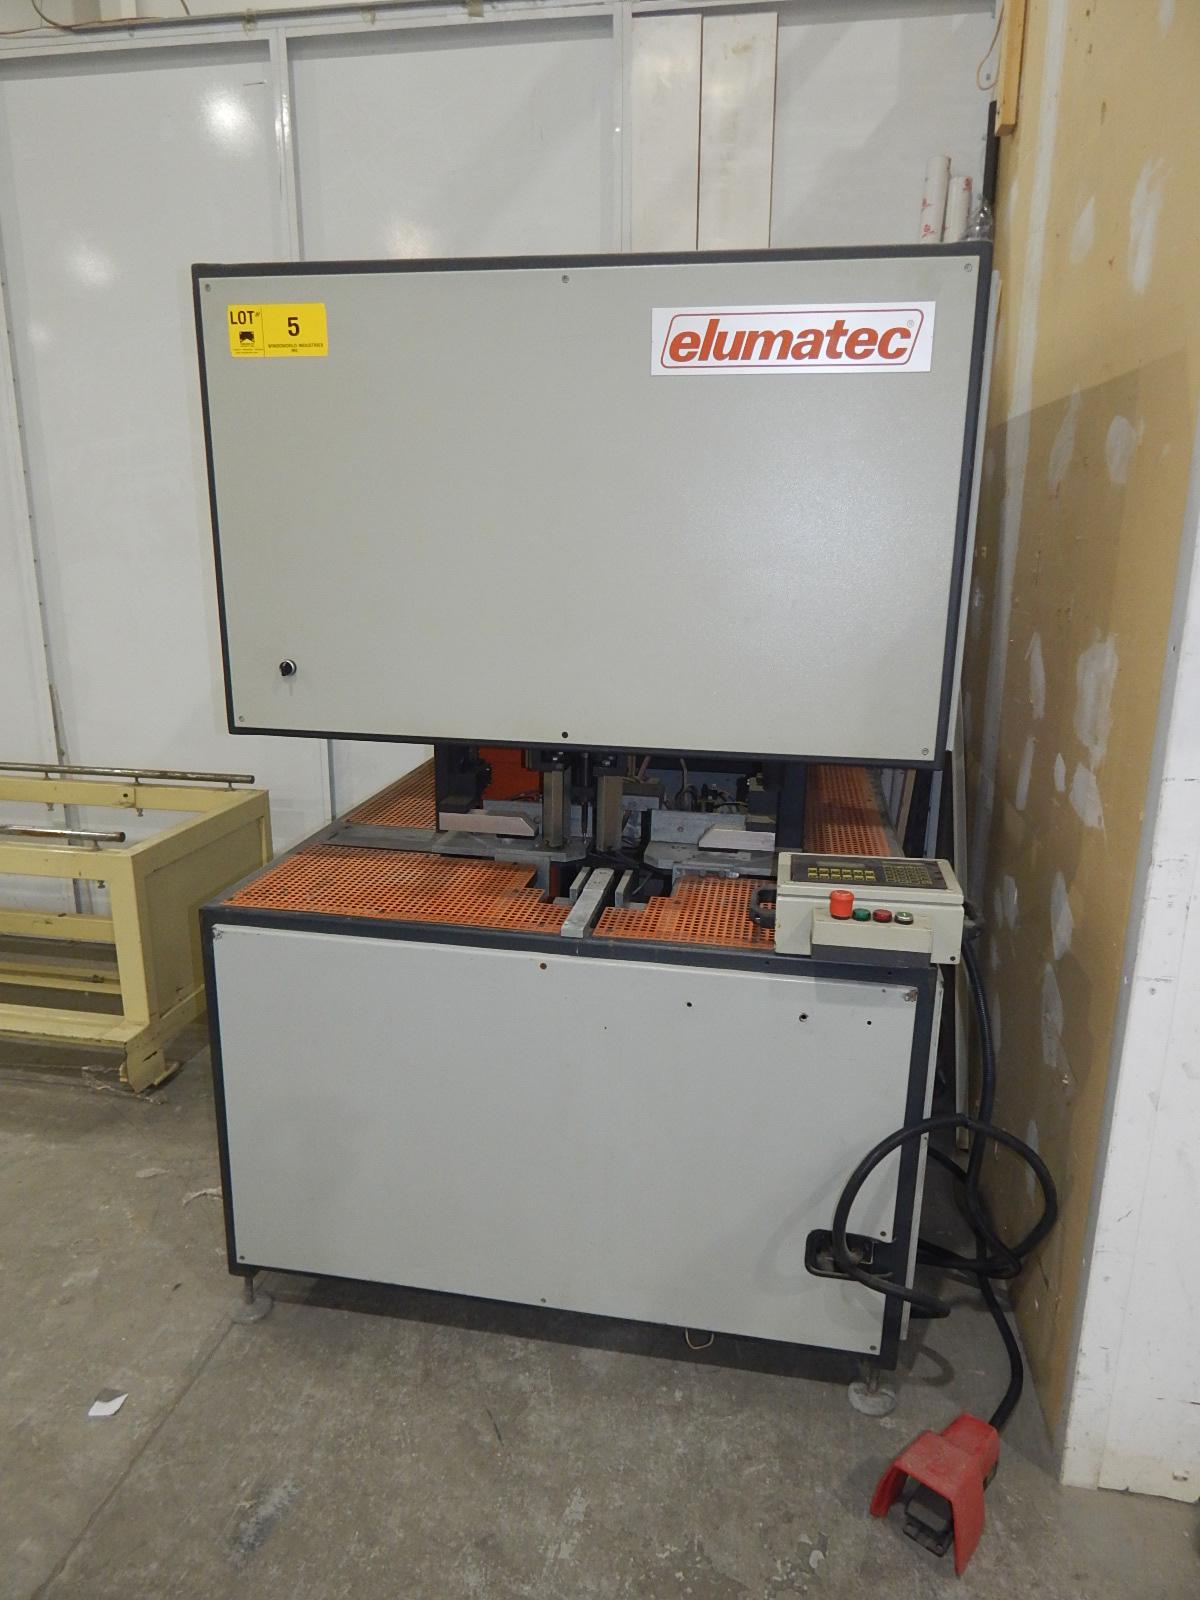 ELUMATEC (2001) TV-873 TRANSOM CLEANER WITH JETTER DIGITAL CONTROL, 400V/3PH/50HZ, S/N: 005 (CI)